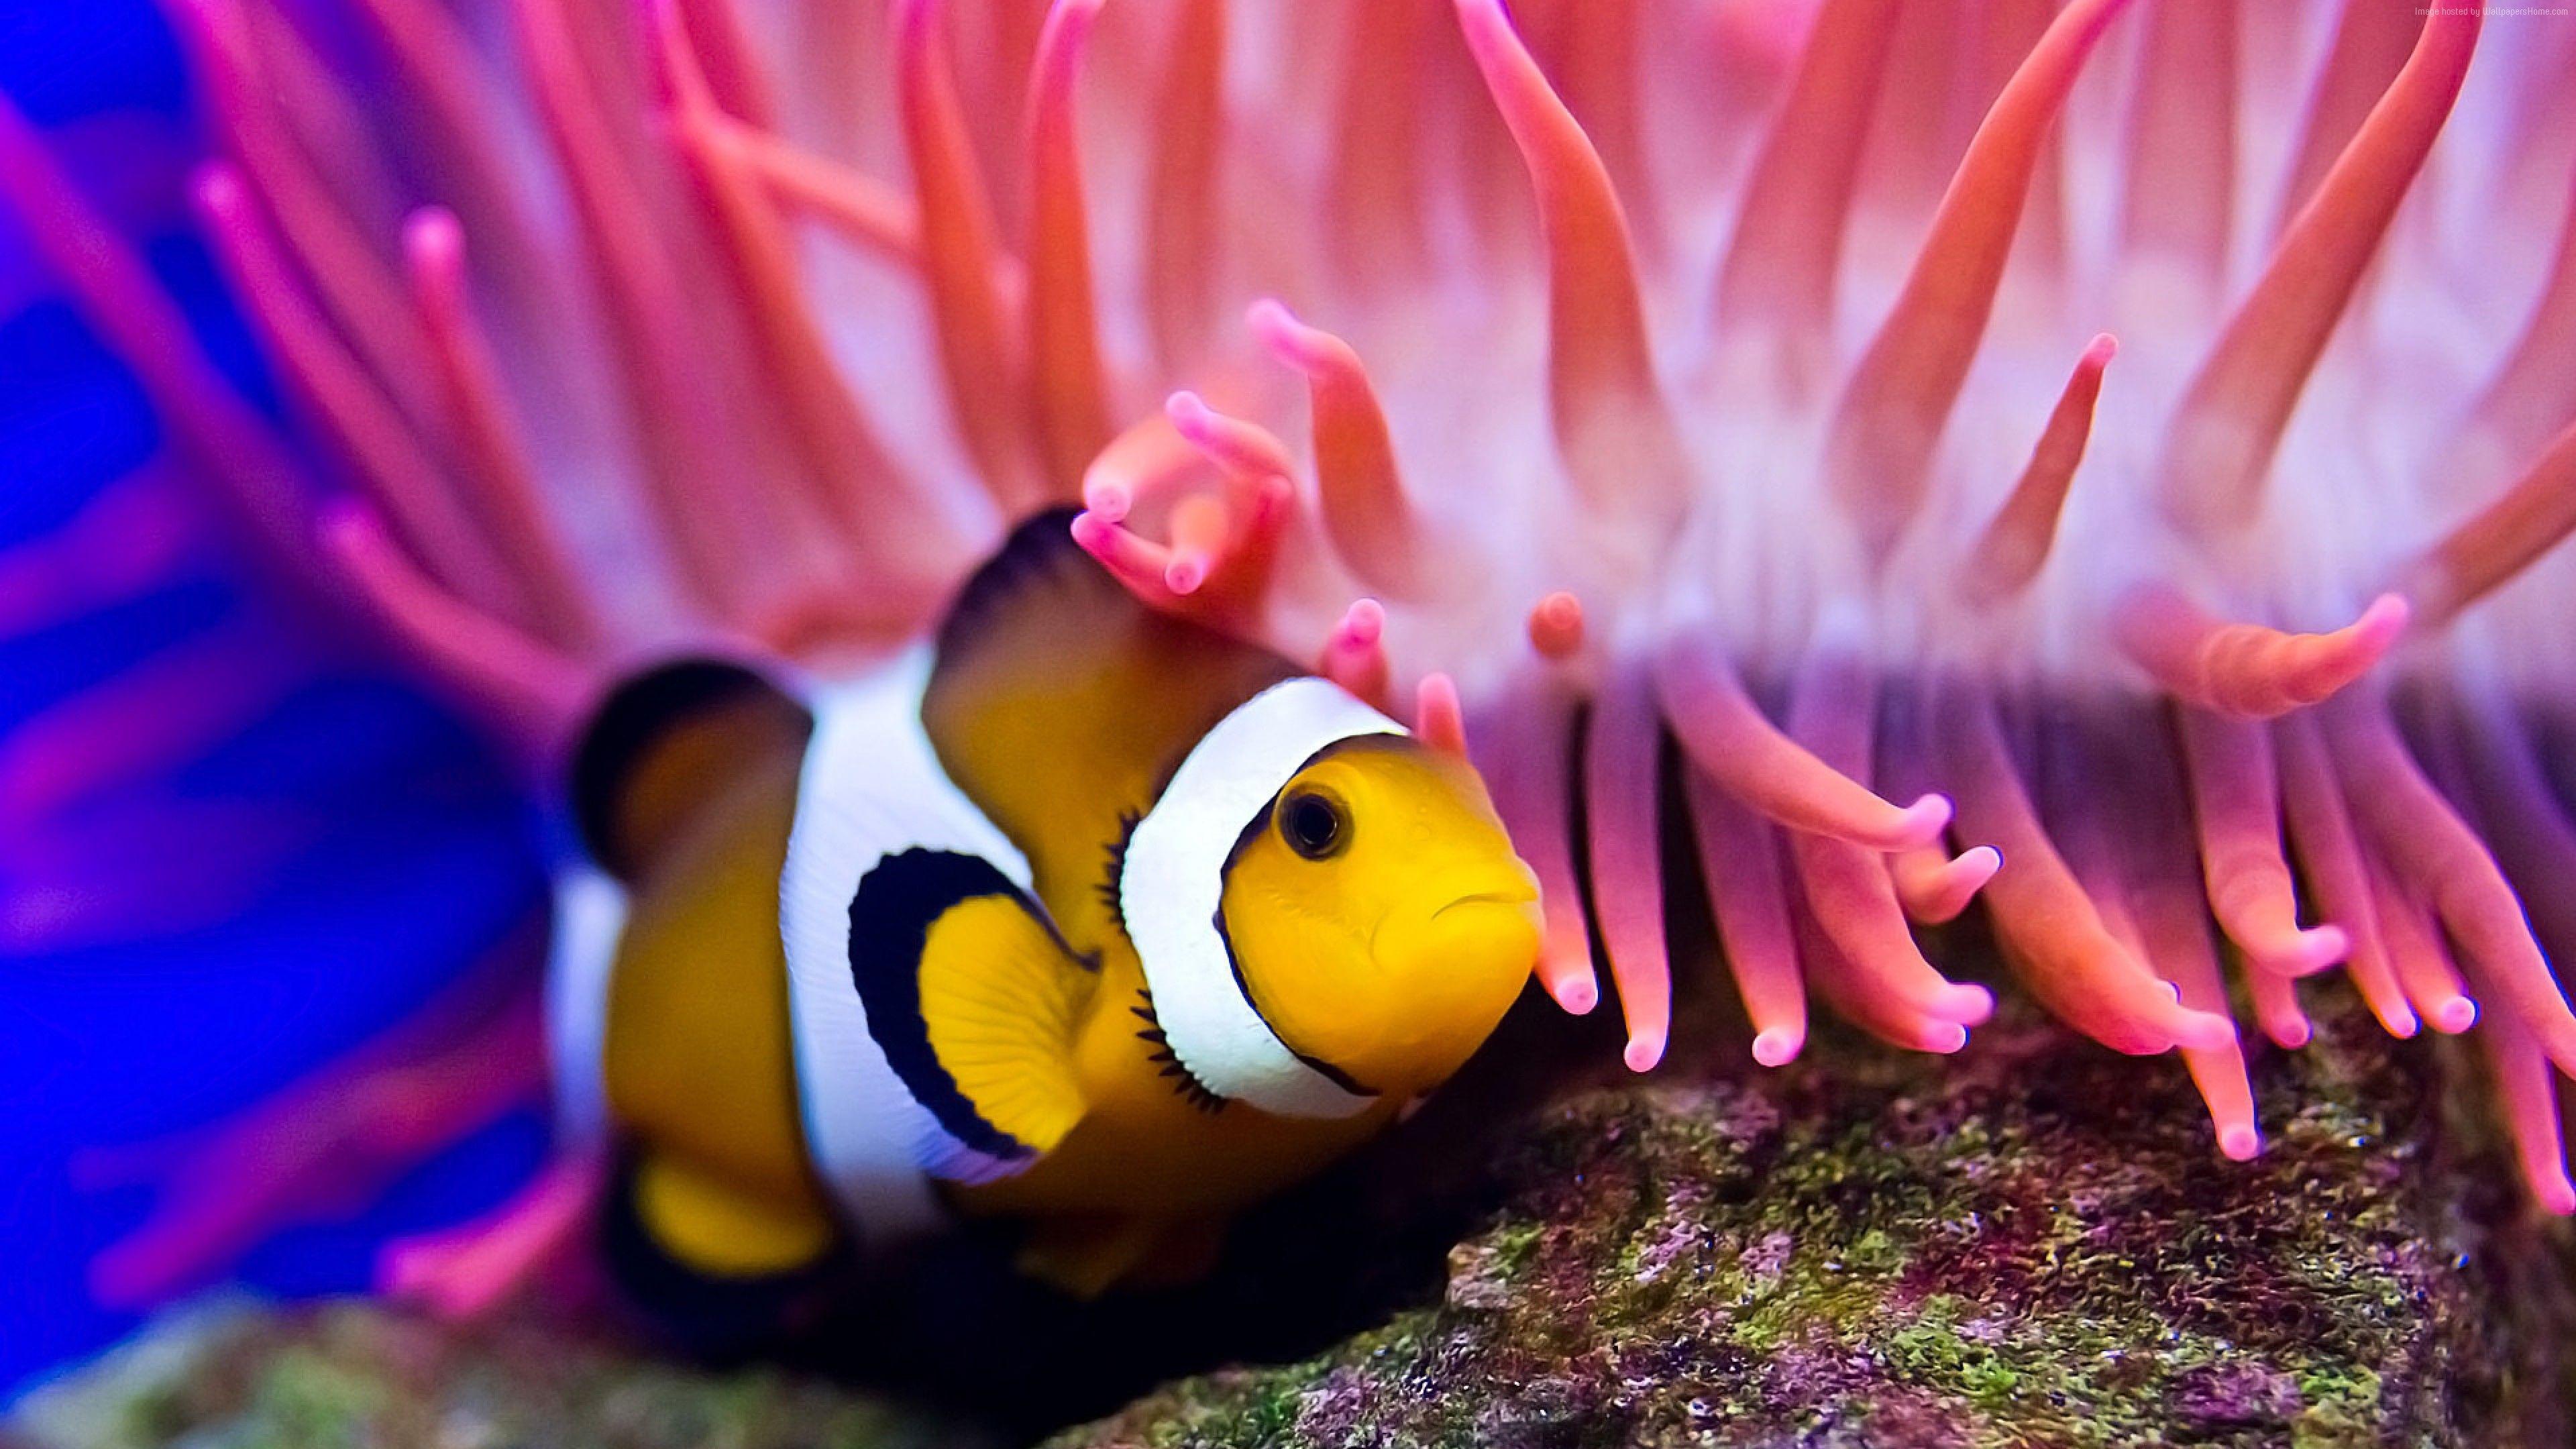 Domain For Sale Clown Fish Fish Wallpaper Beautiful Fish